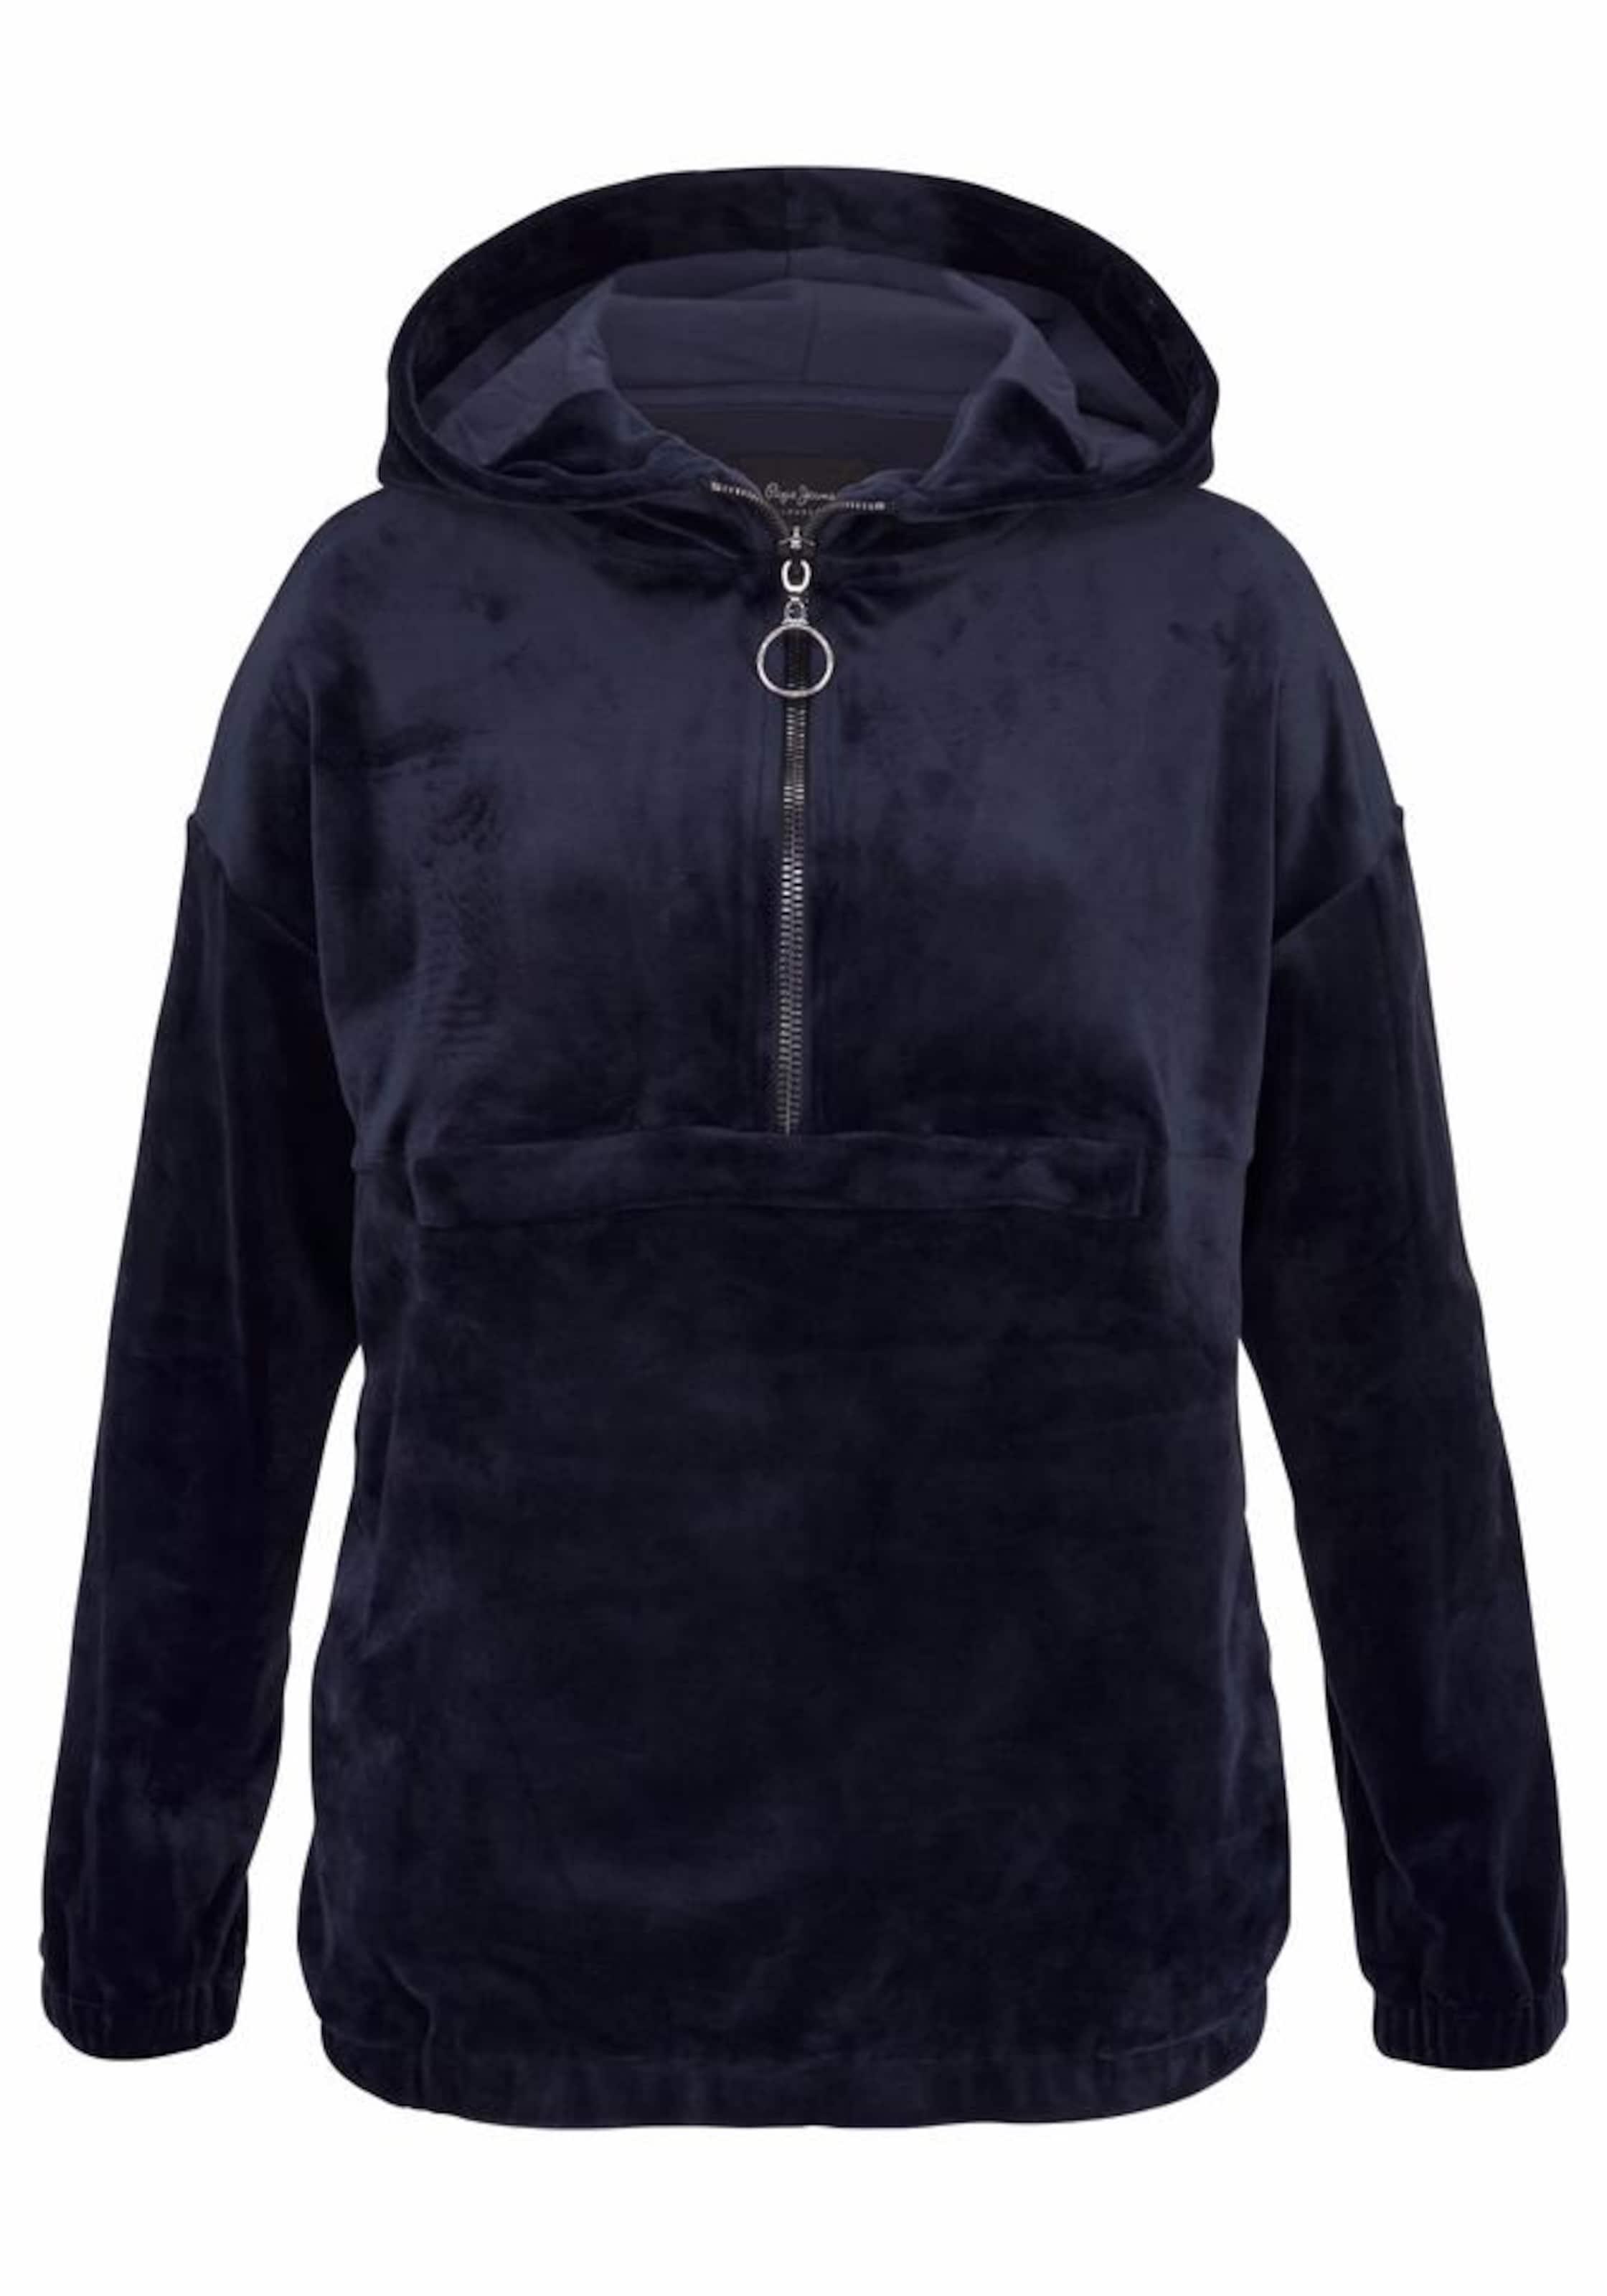 Pepe Jeans Sweatshirt 'TERESA' Neueste Online mE0cFaa4